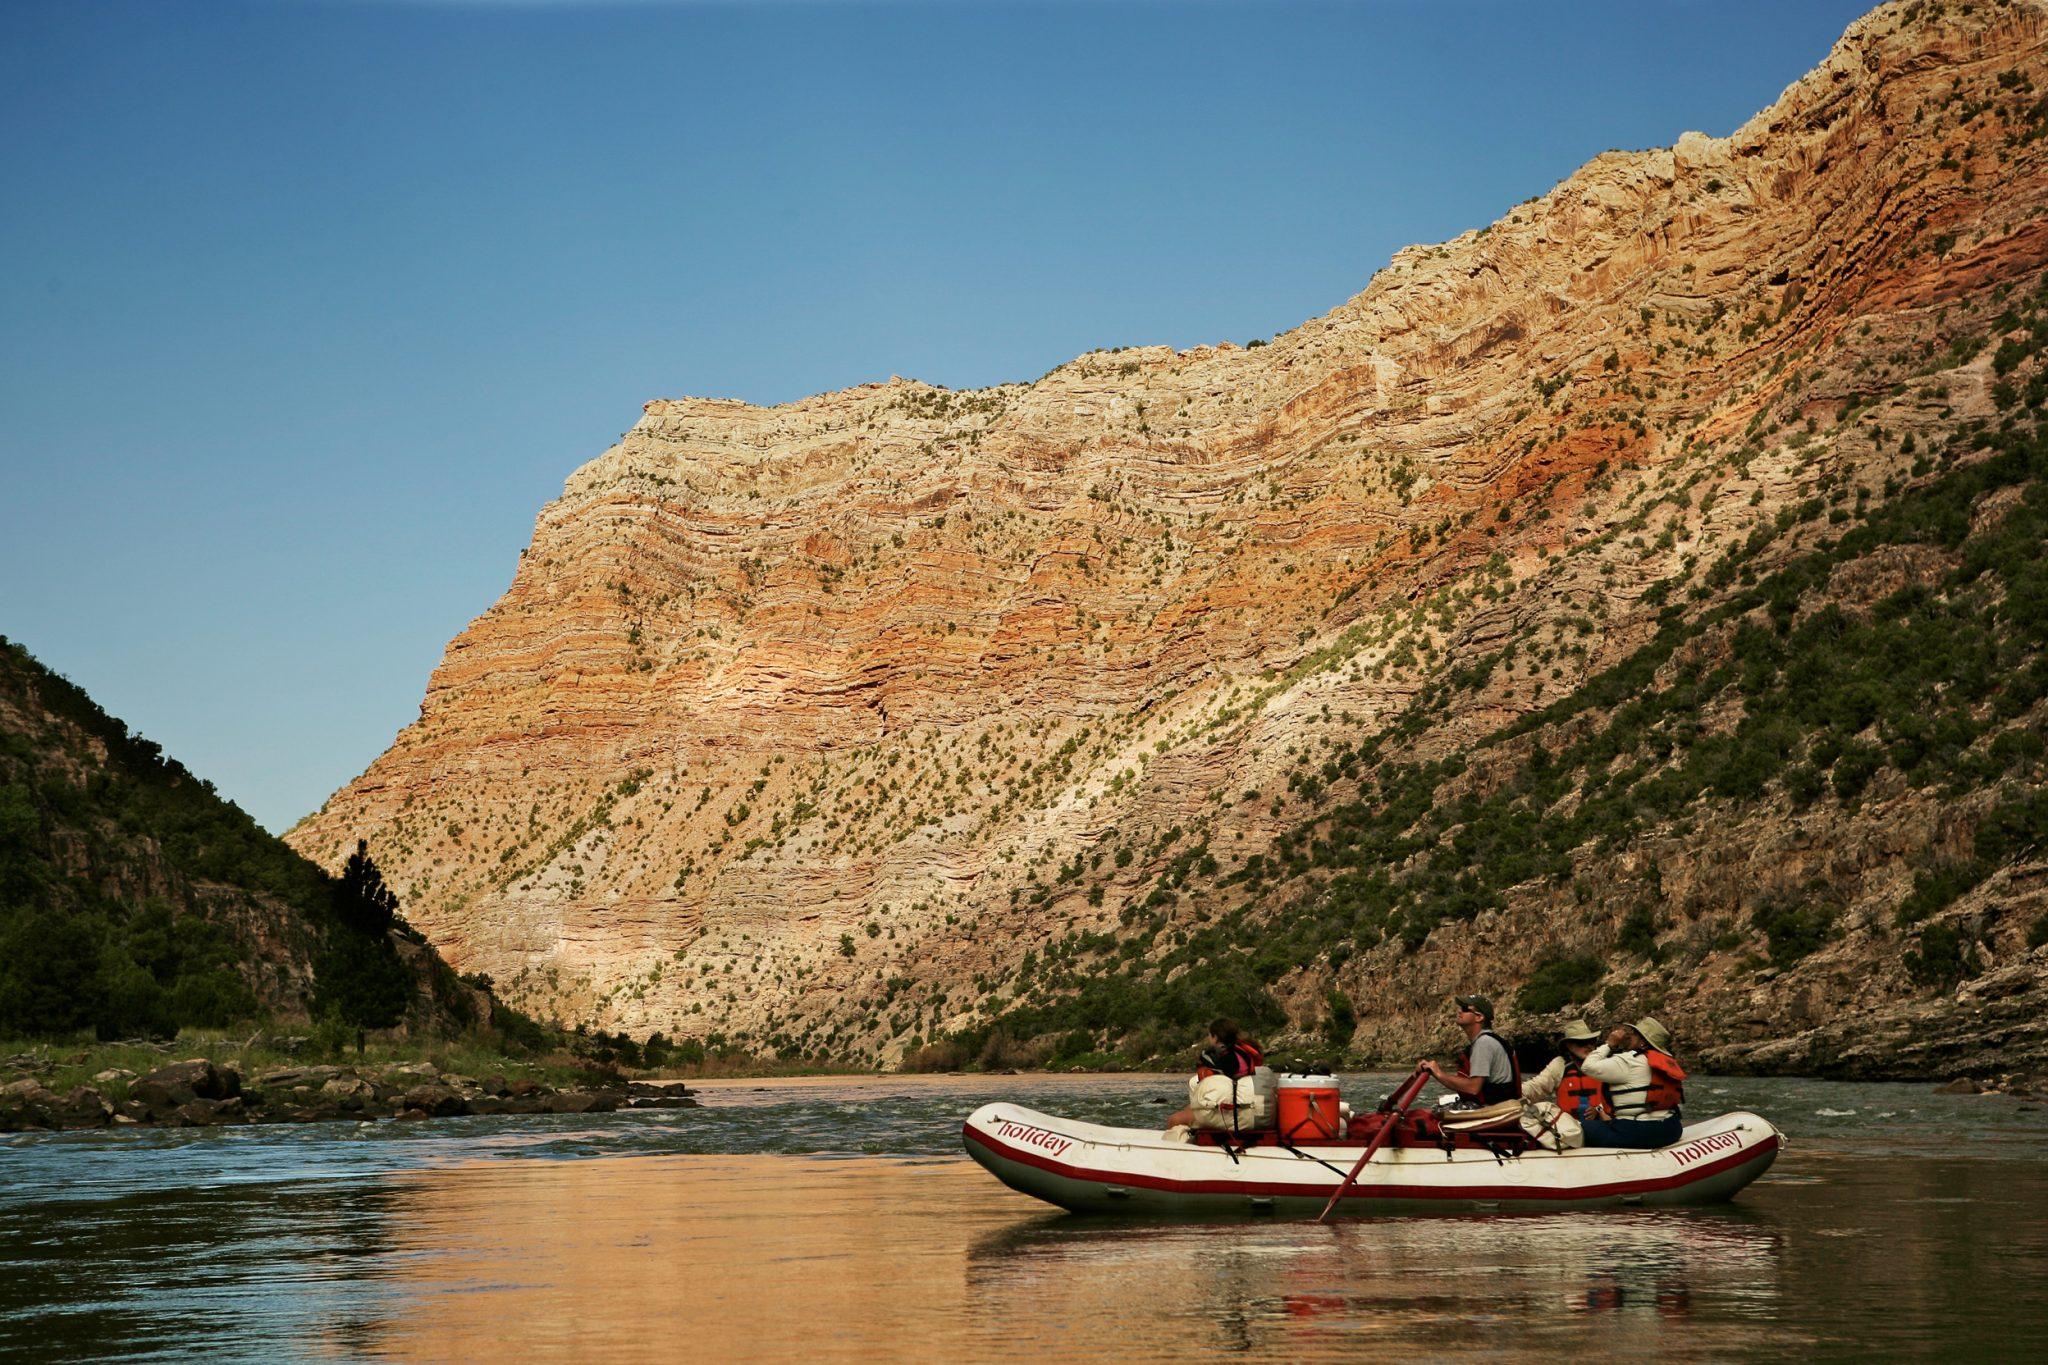 Lodore Canyon River Boats